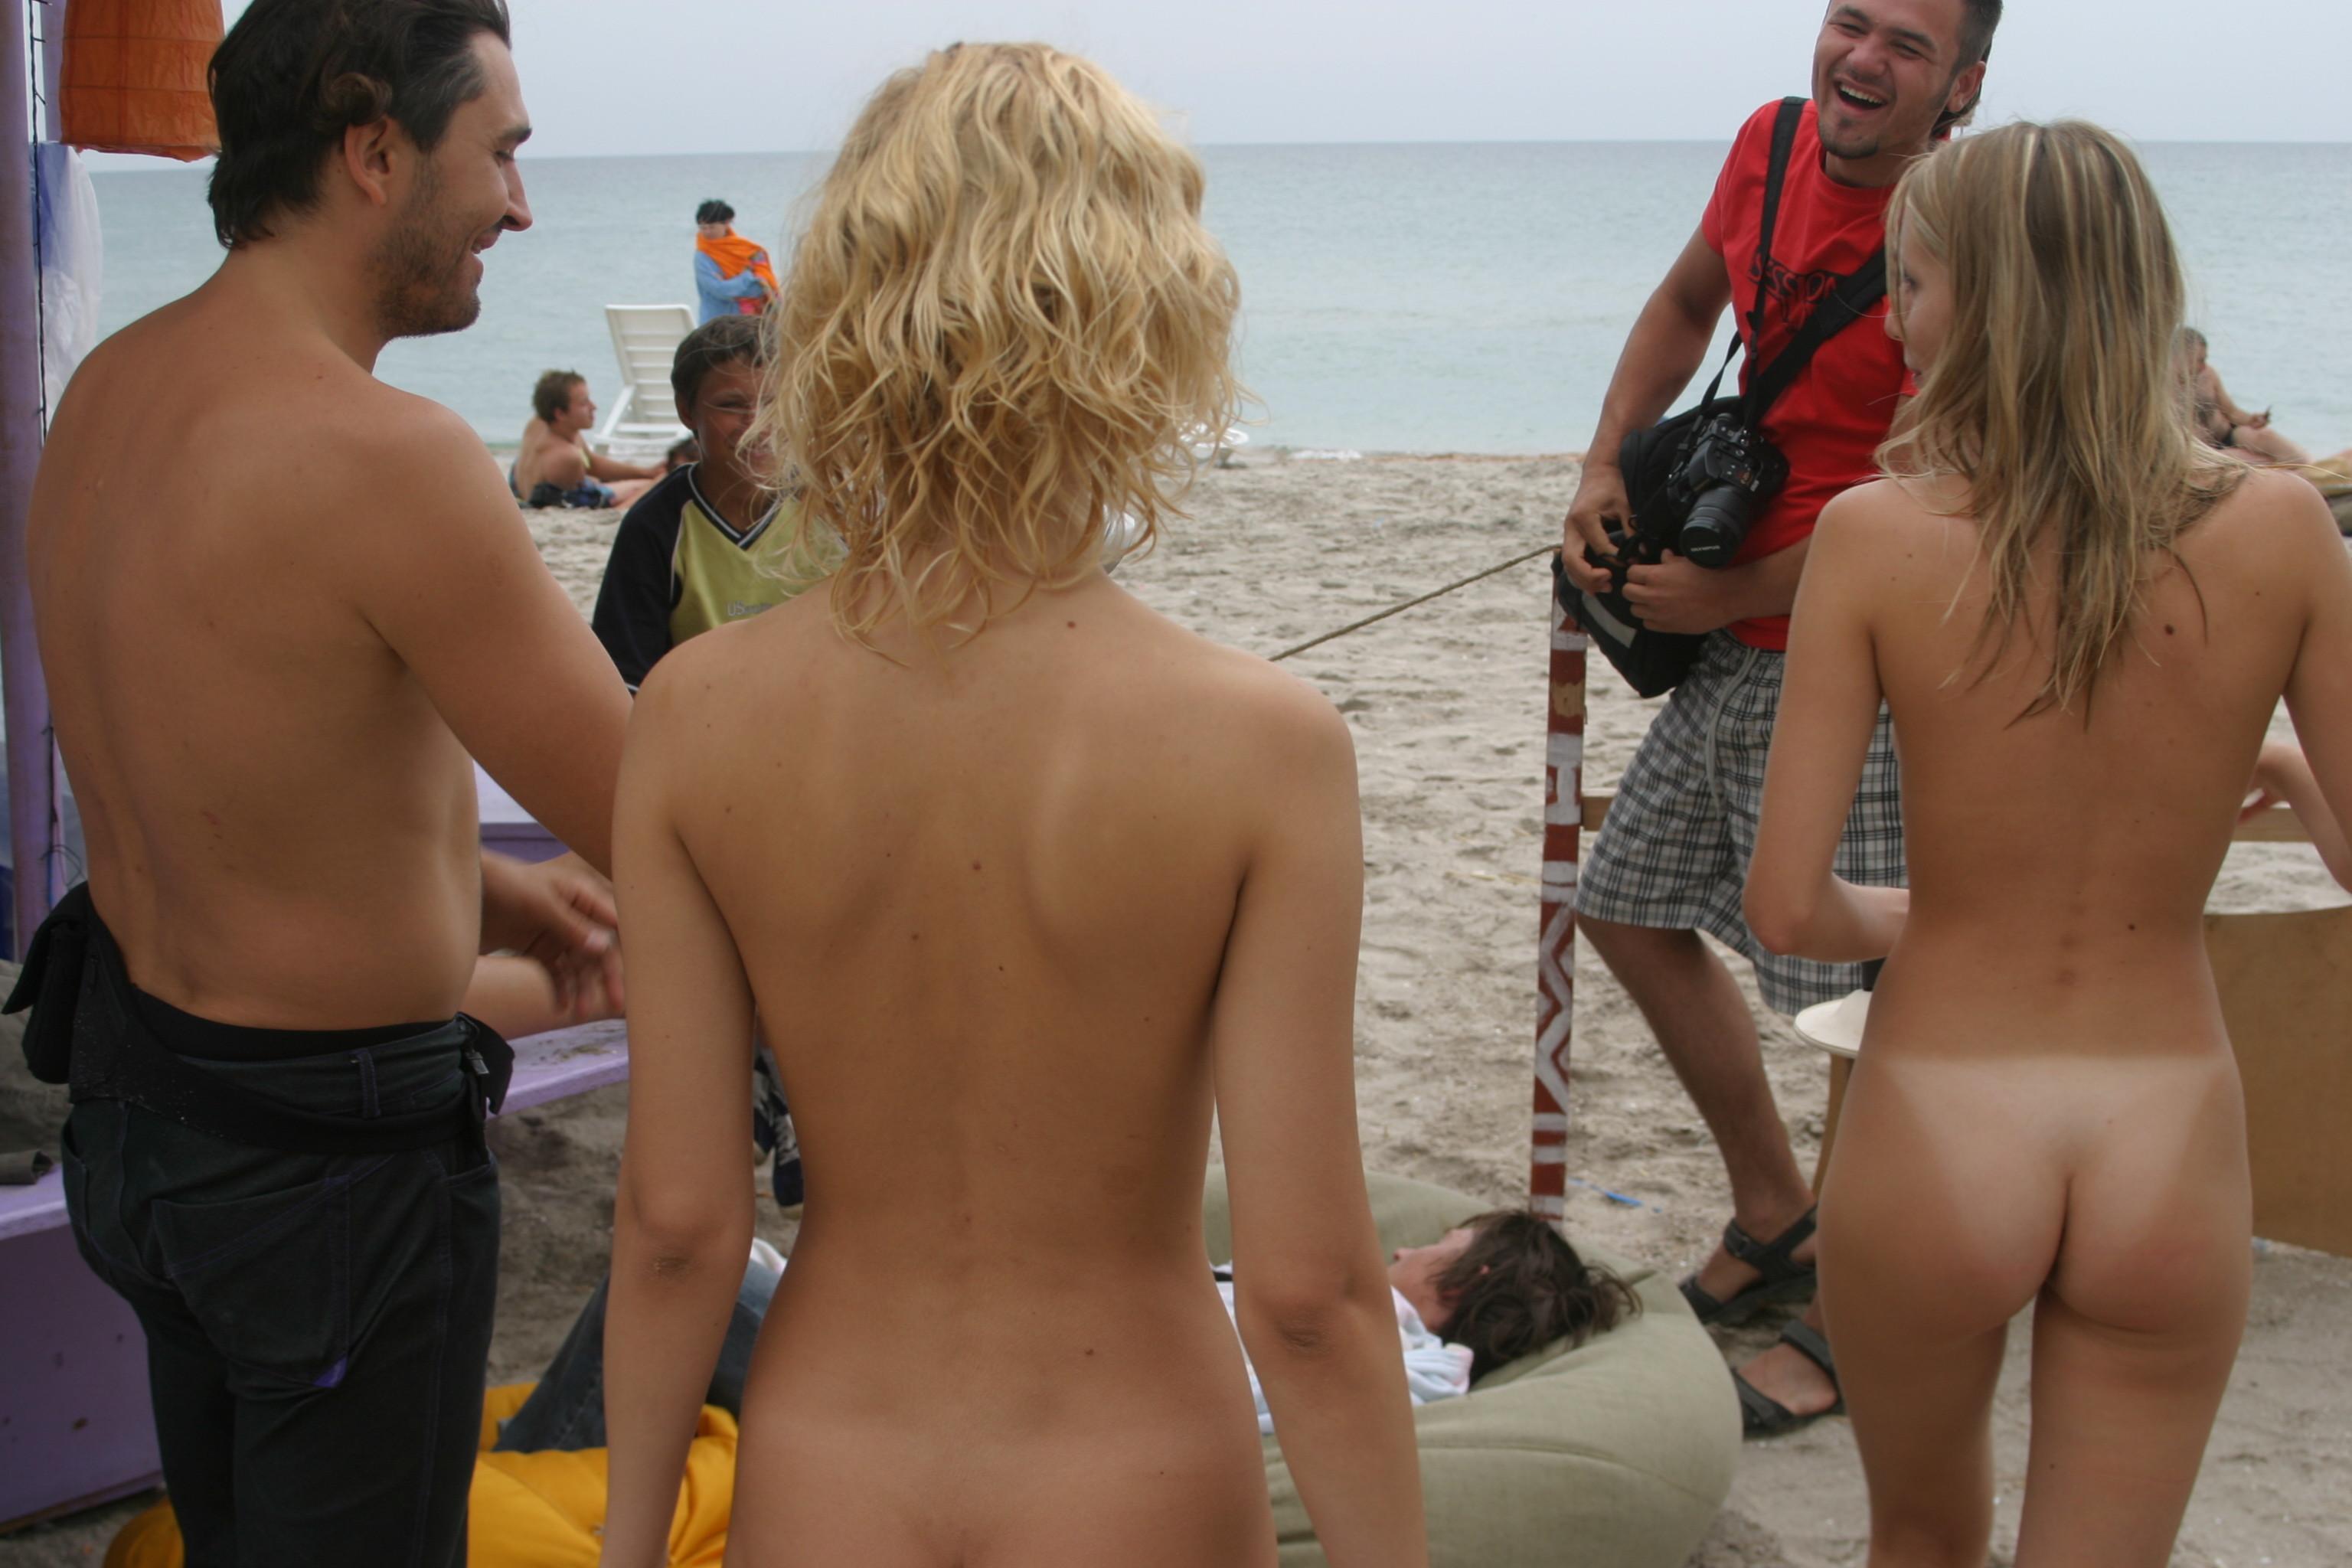 vika-y-lena-l-beach-nude-in-public-metart-22